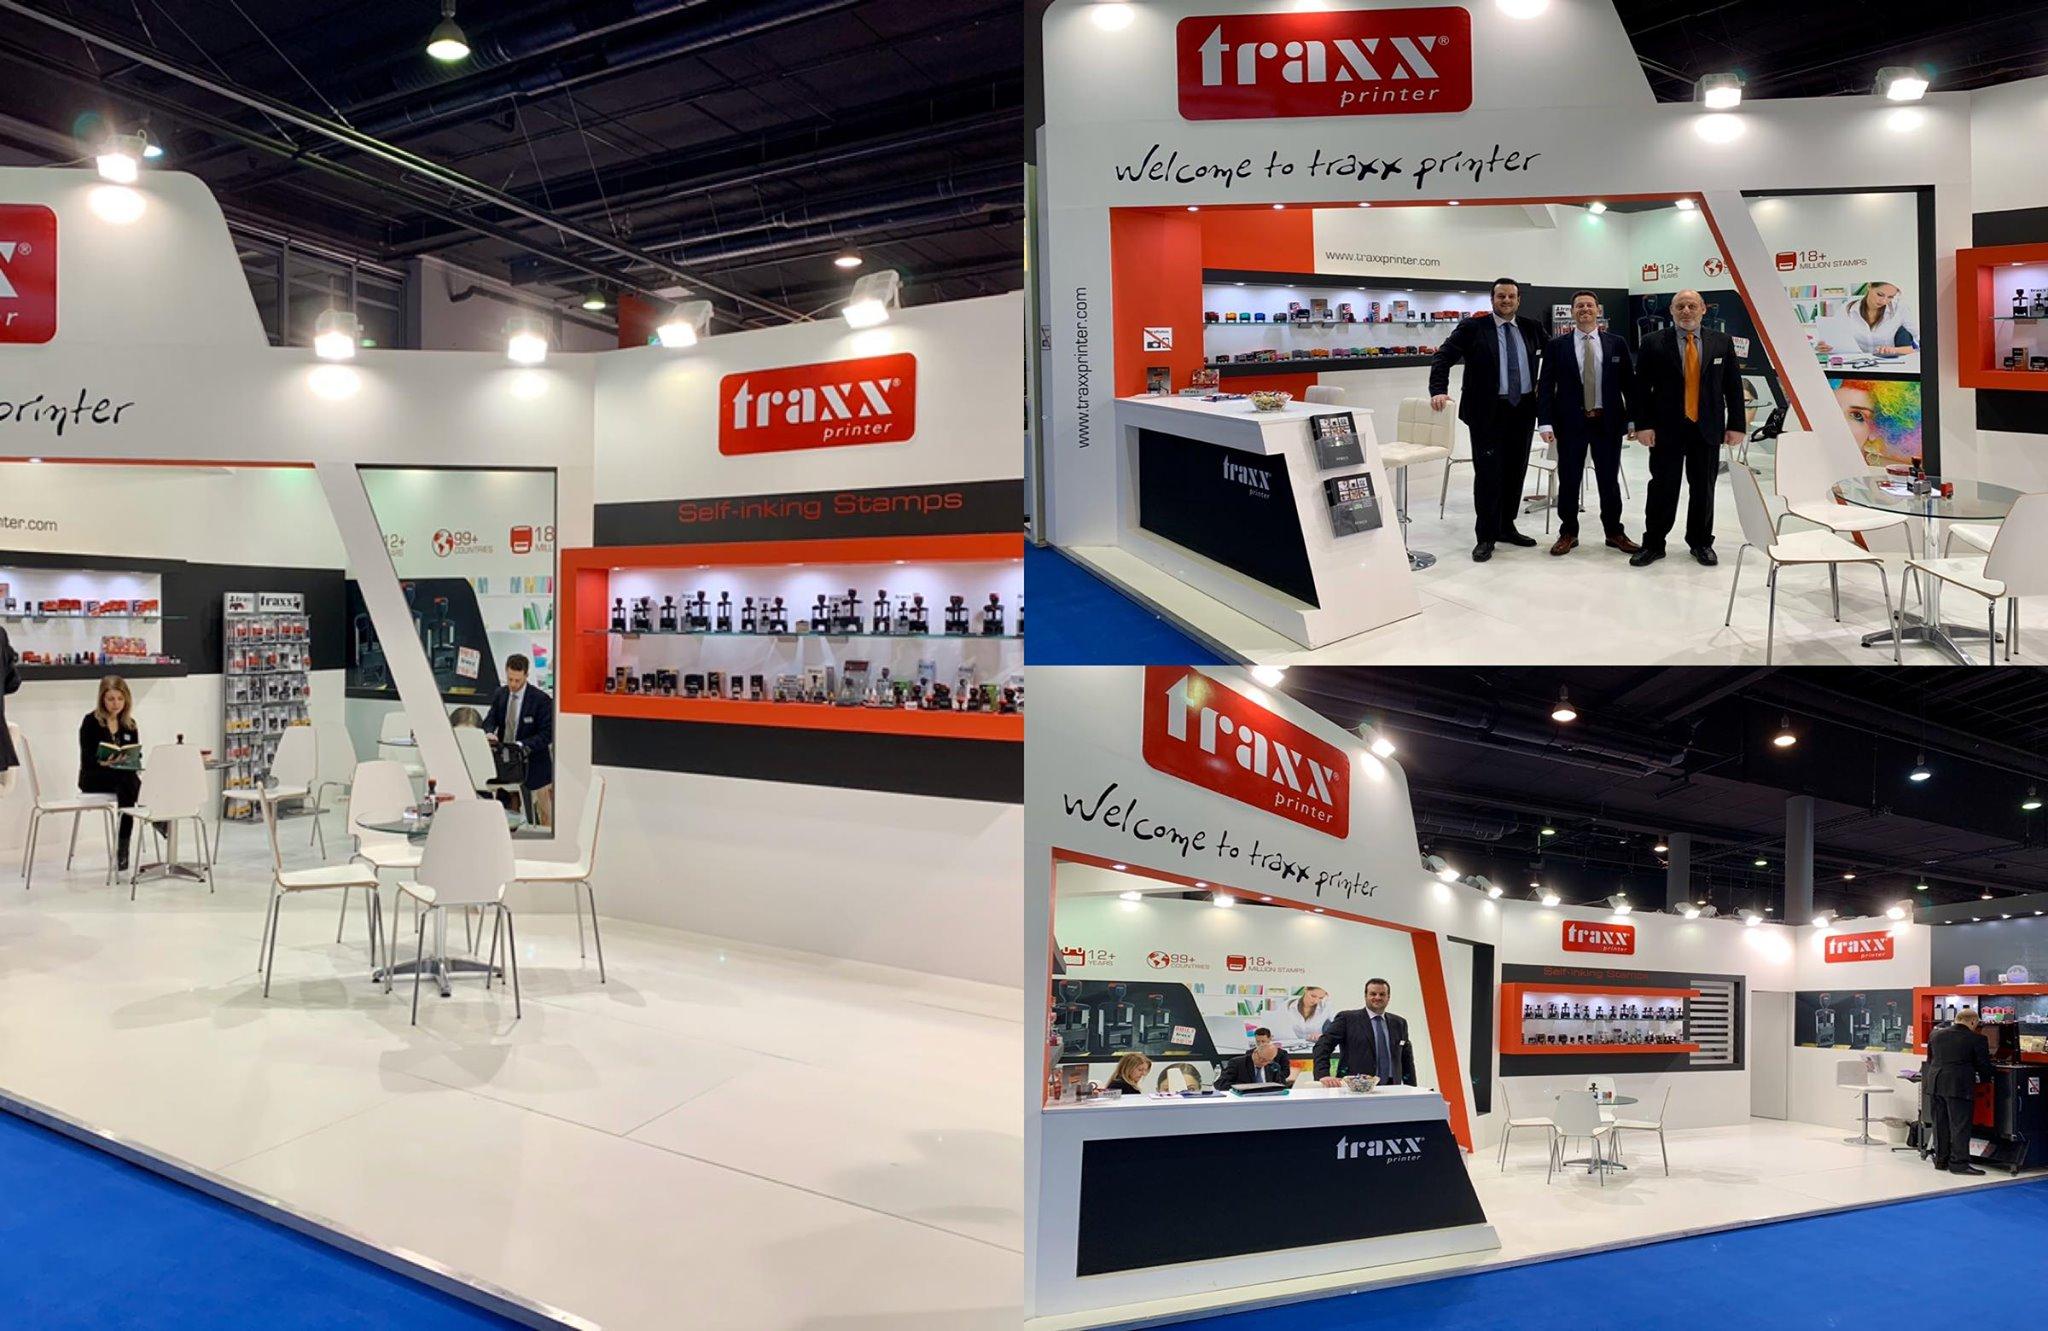 TRAXX @ Paperworld 2020